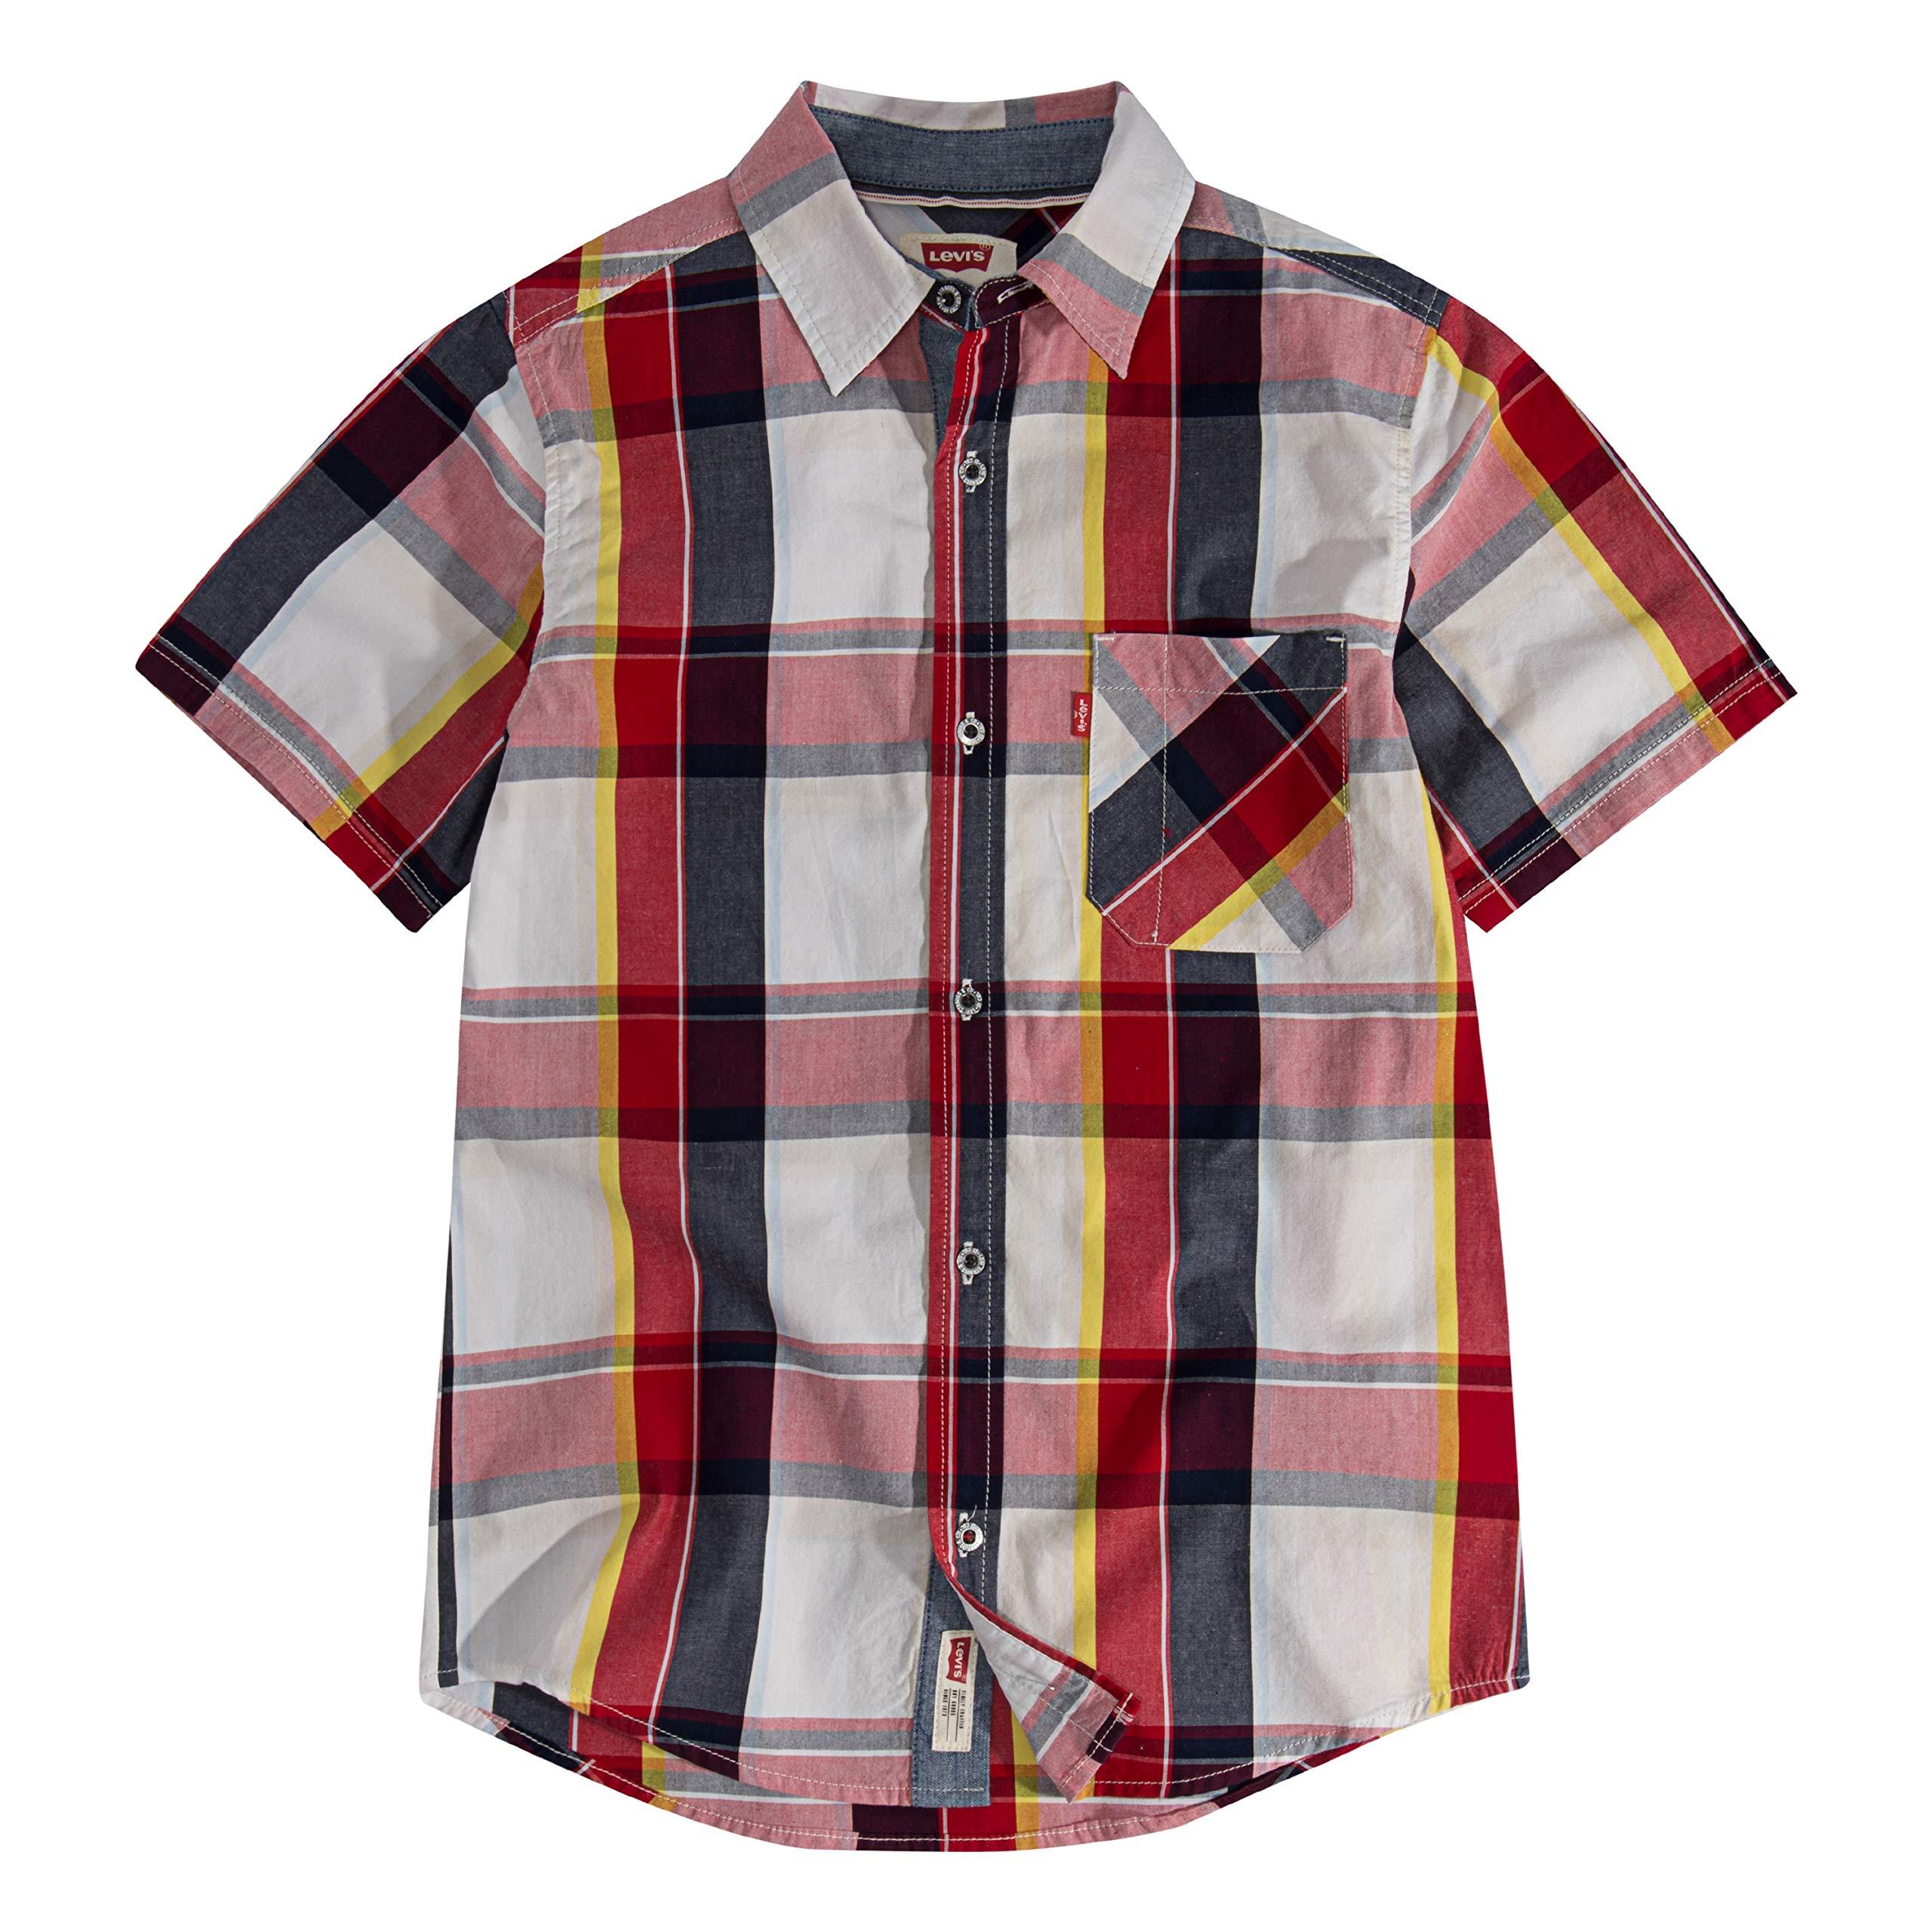 Levi's Boys' Big Short Sleeve Button Up Shirt, Marshmallow Plaid, L